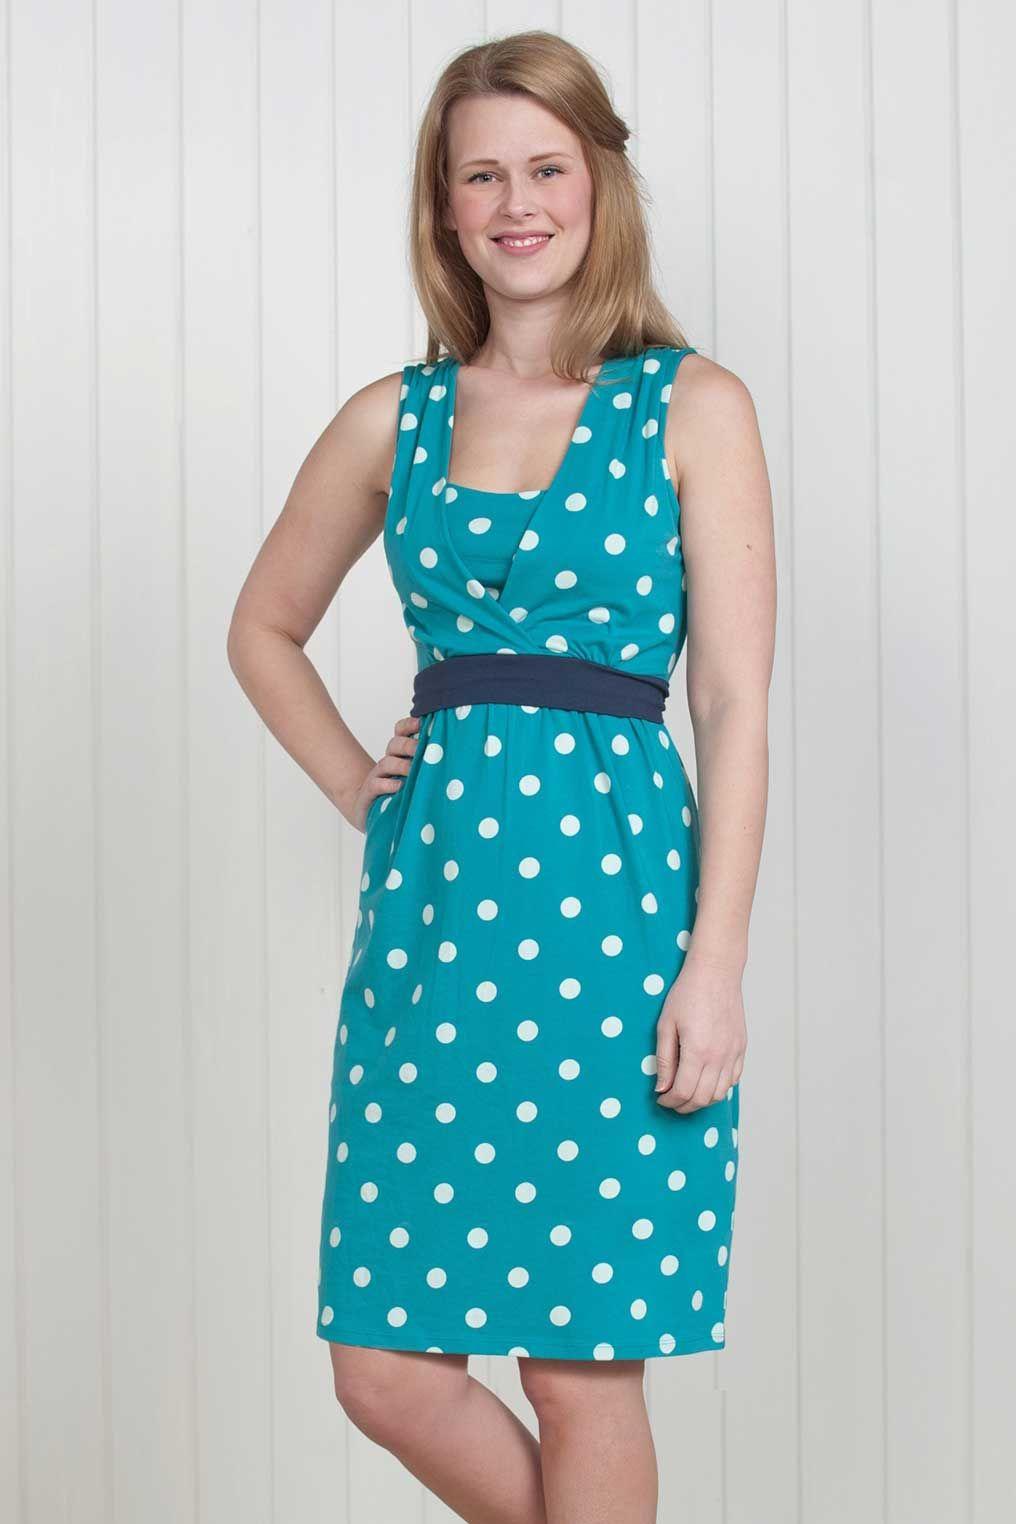 Breastfeeding summer dresses uk